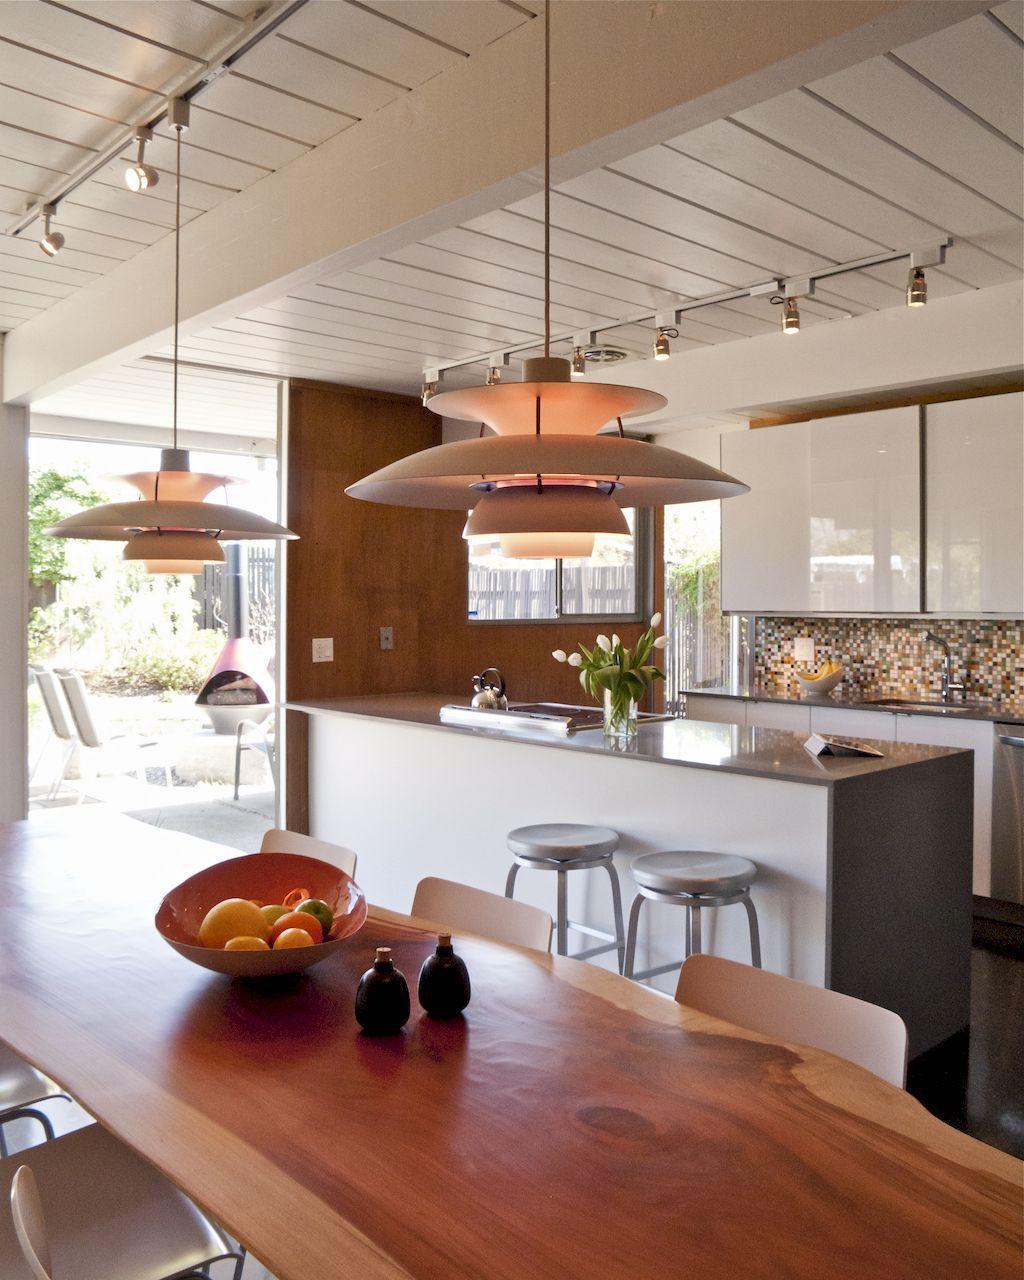 Charming mid century kitchen design ideas kitchen design mid